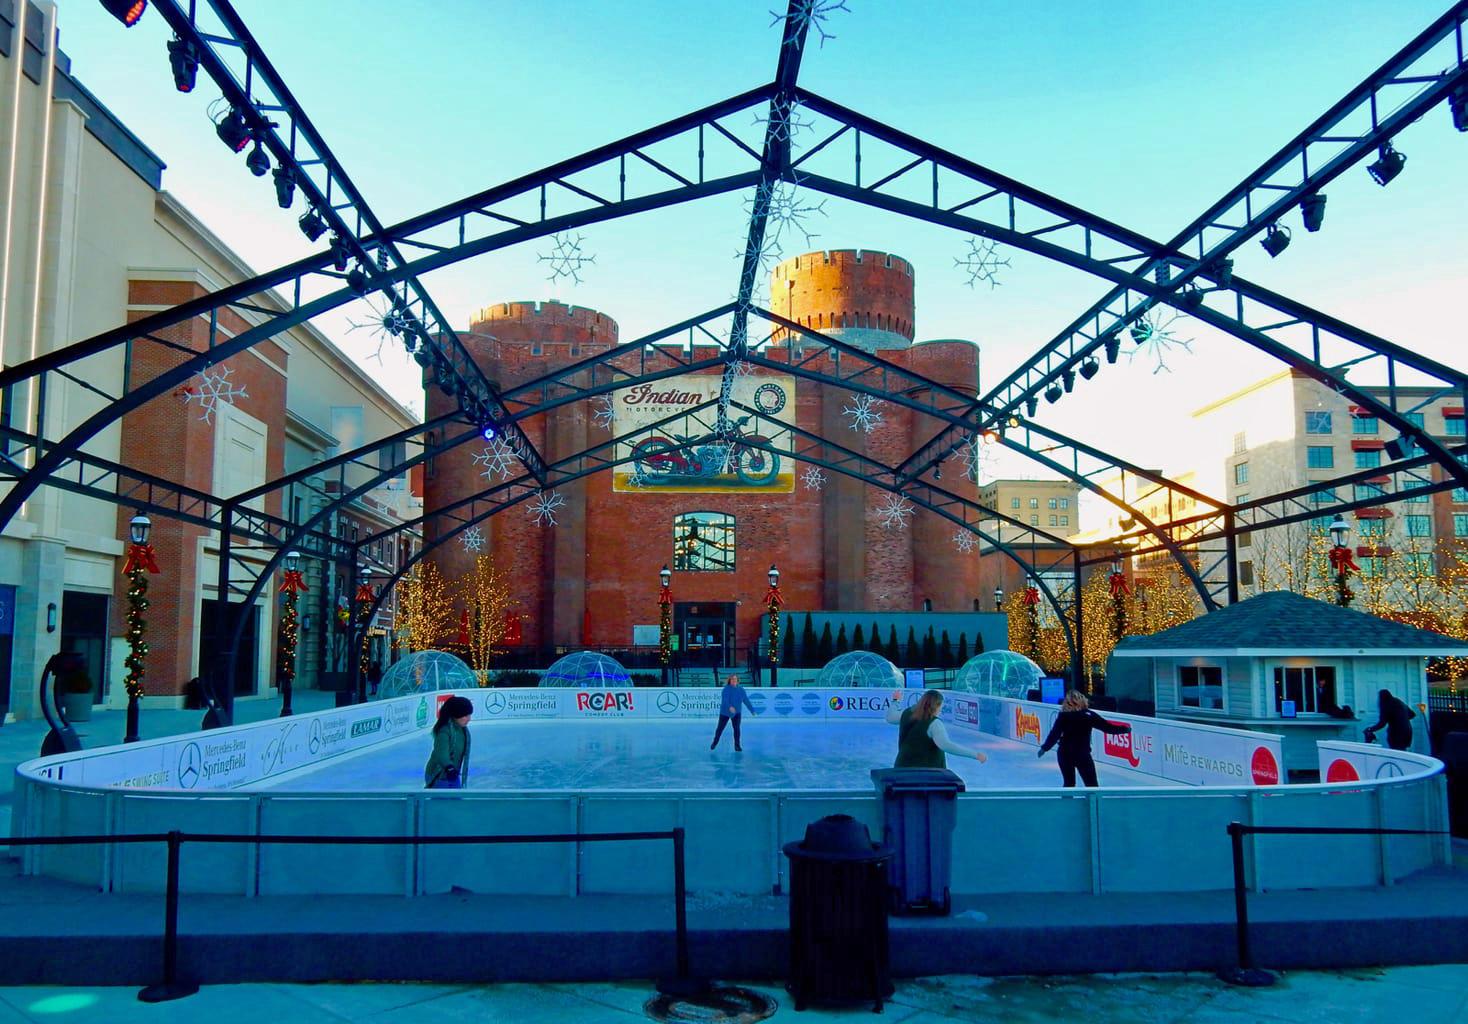 blog mgm spfld skating rink2